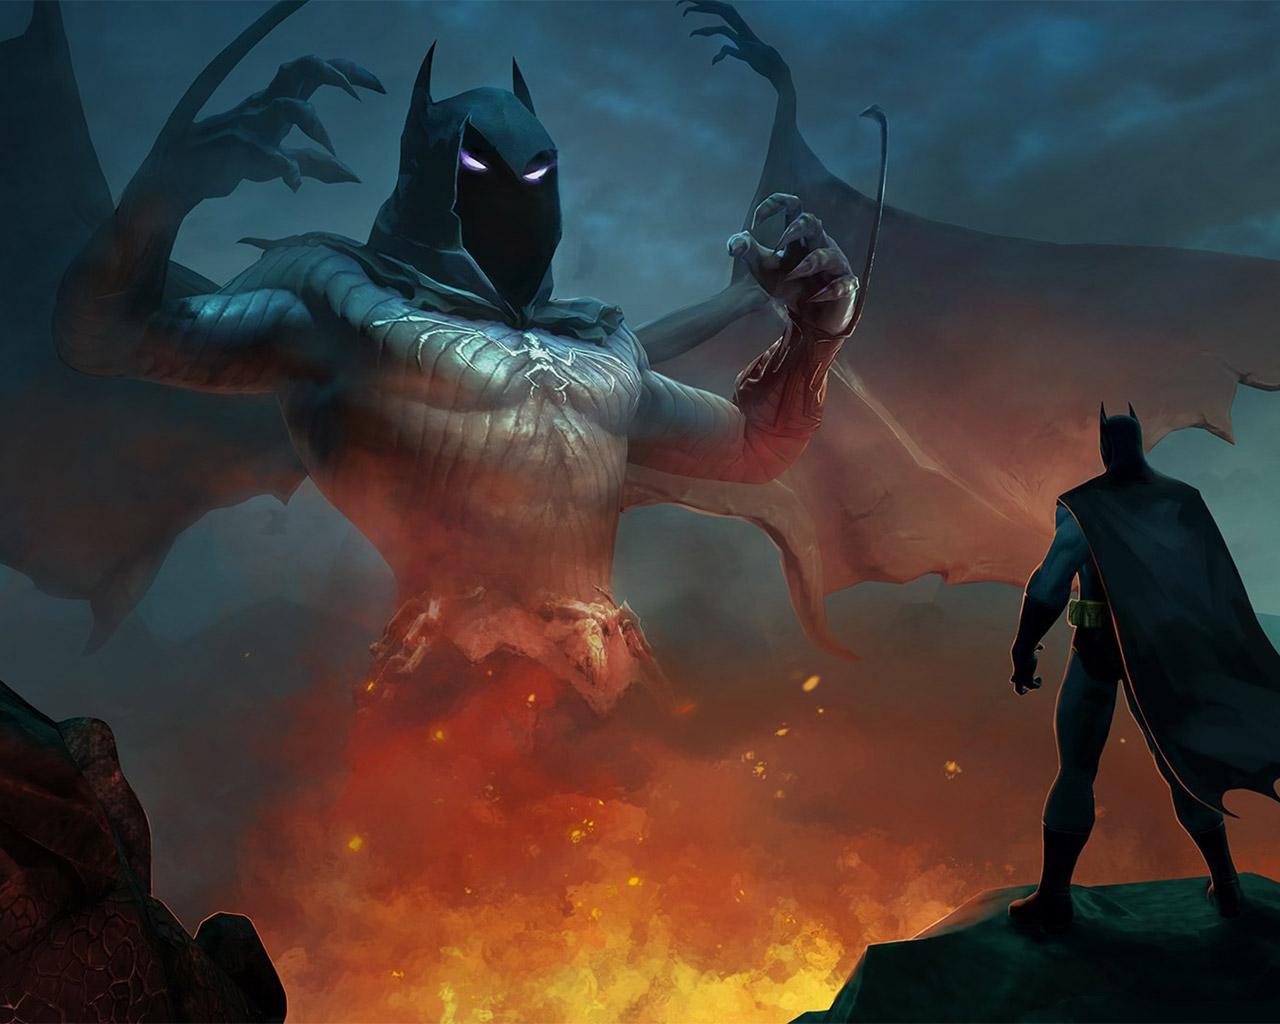 DC Universe Online Wallpaper in 1280x1024